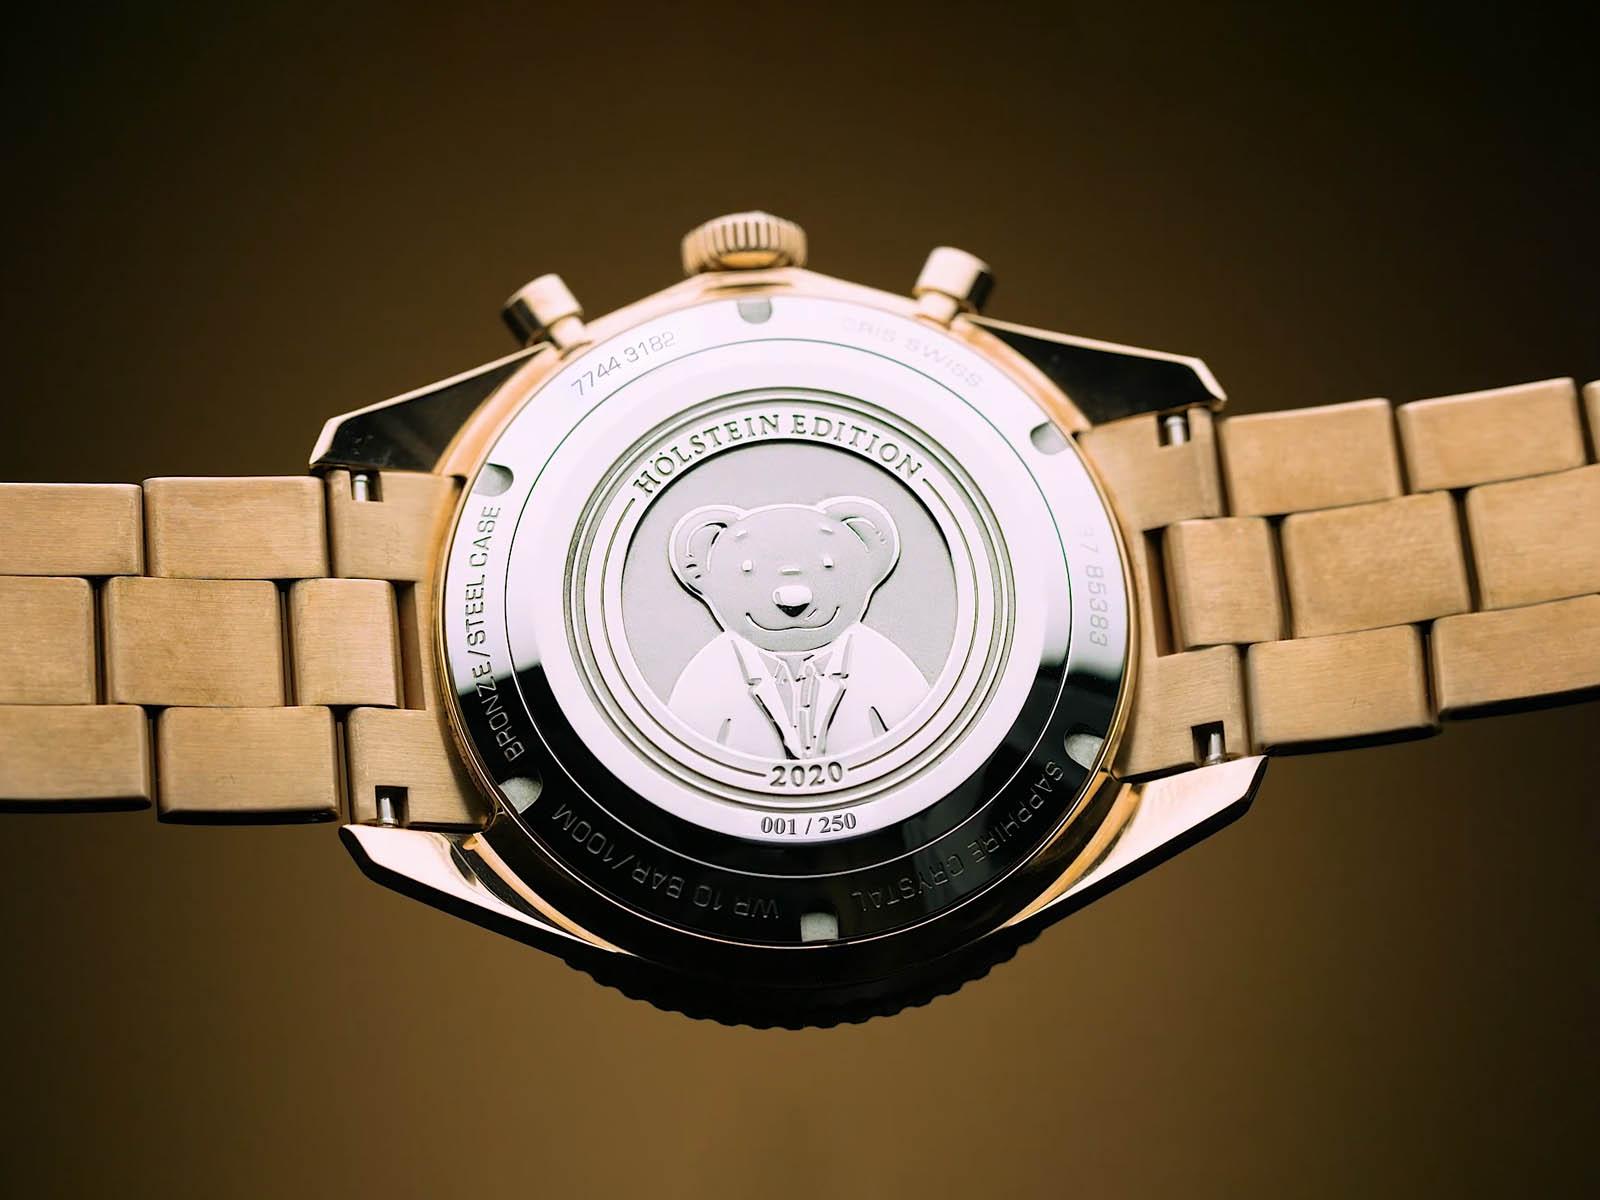 01-771-7744-3182-set-oris-divers-sixty-five-chronograph-holstein-edition-6-.jpg